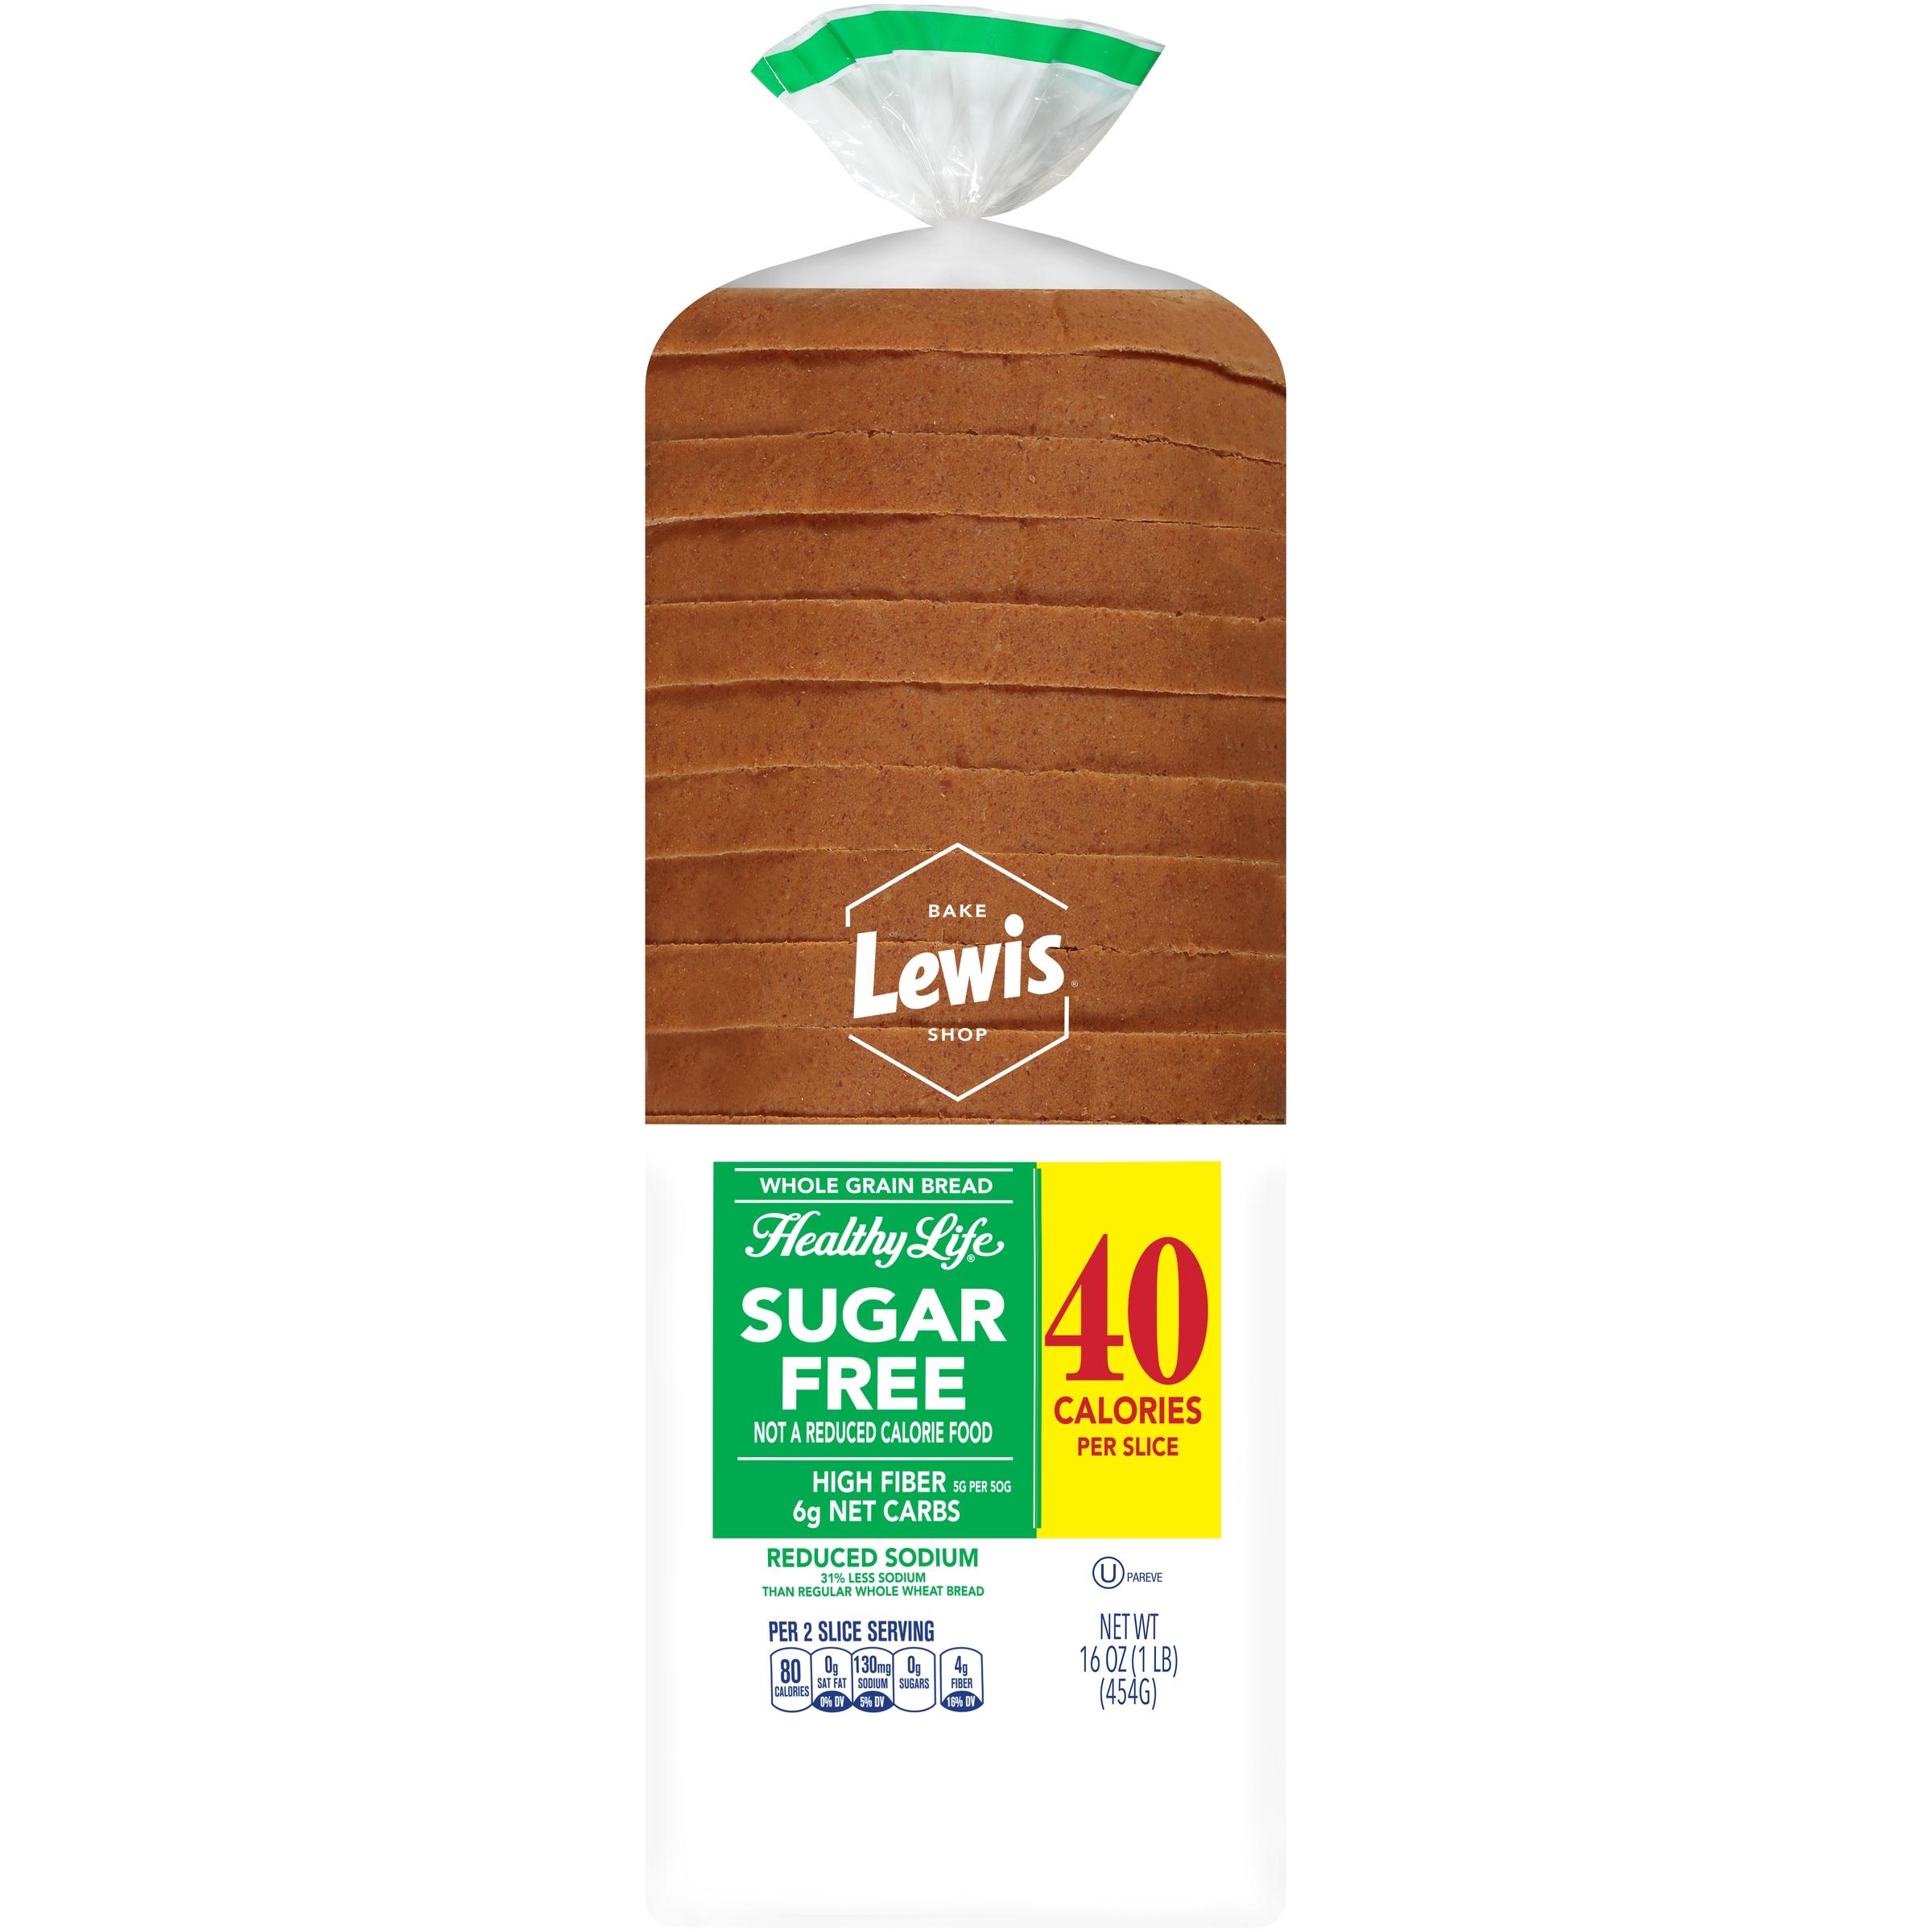 Lewis® Bake Shop Healthy Life® Sugar Free Whole Grain Bread 16 oz. Loaf